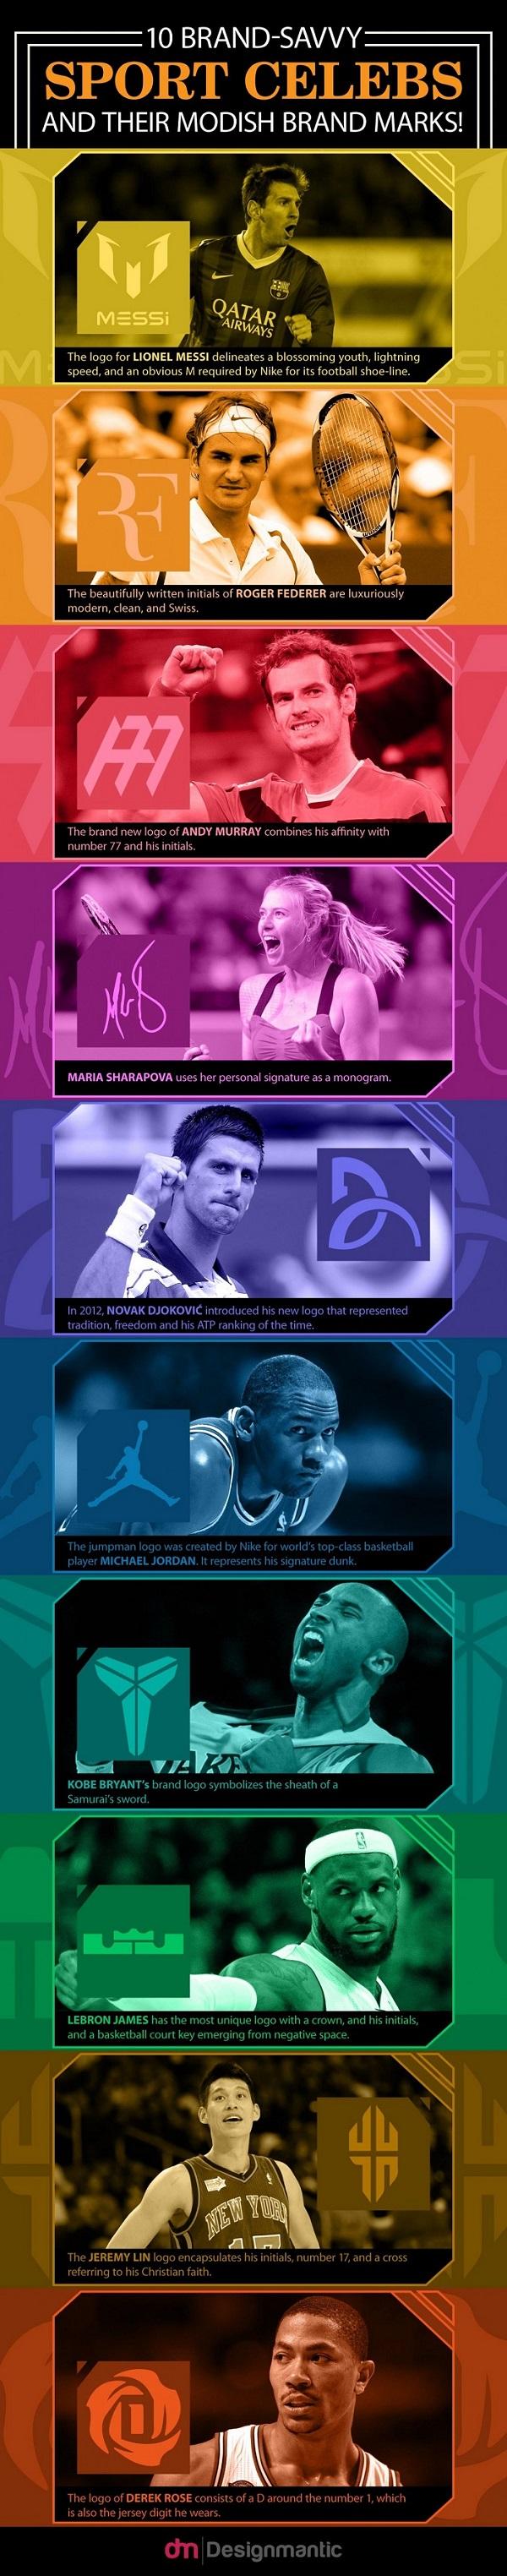 Sport Celebs And Branding Logos